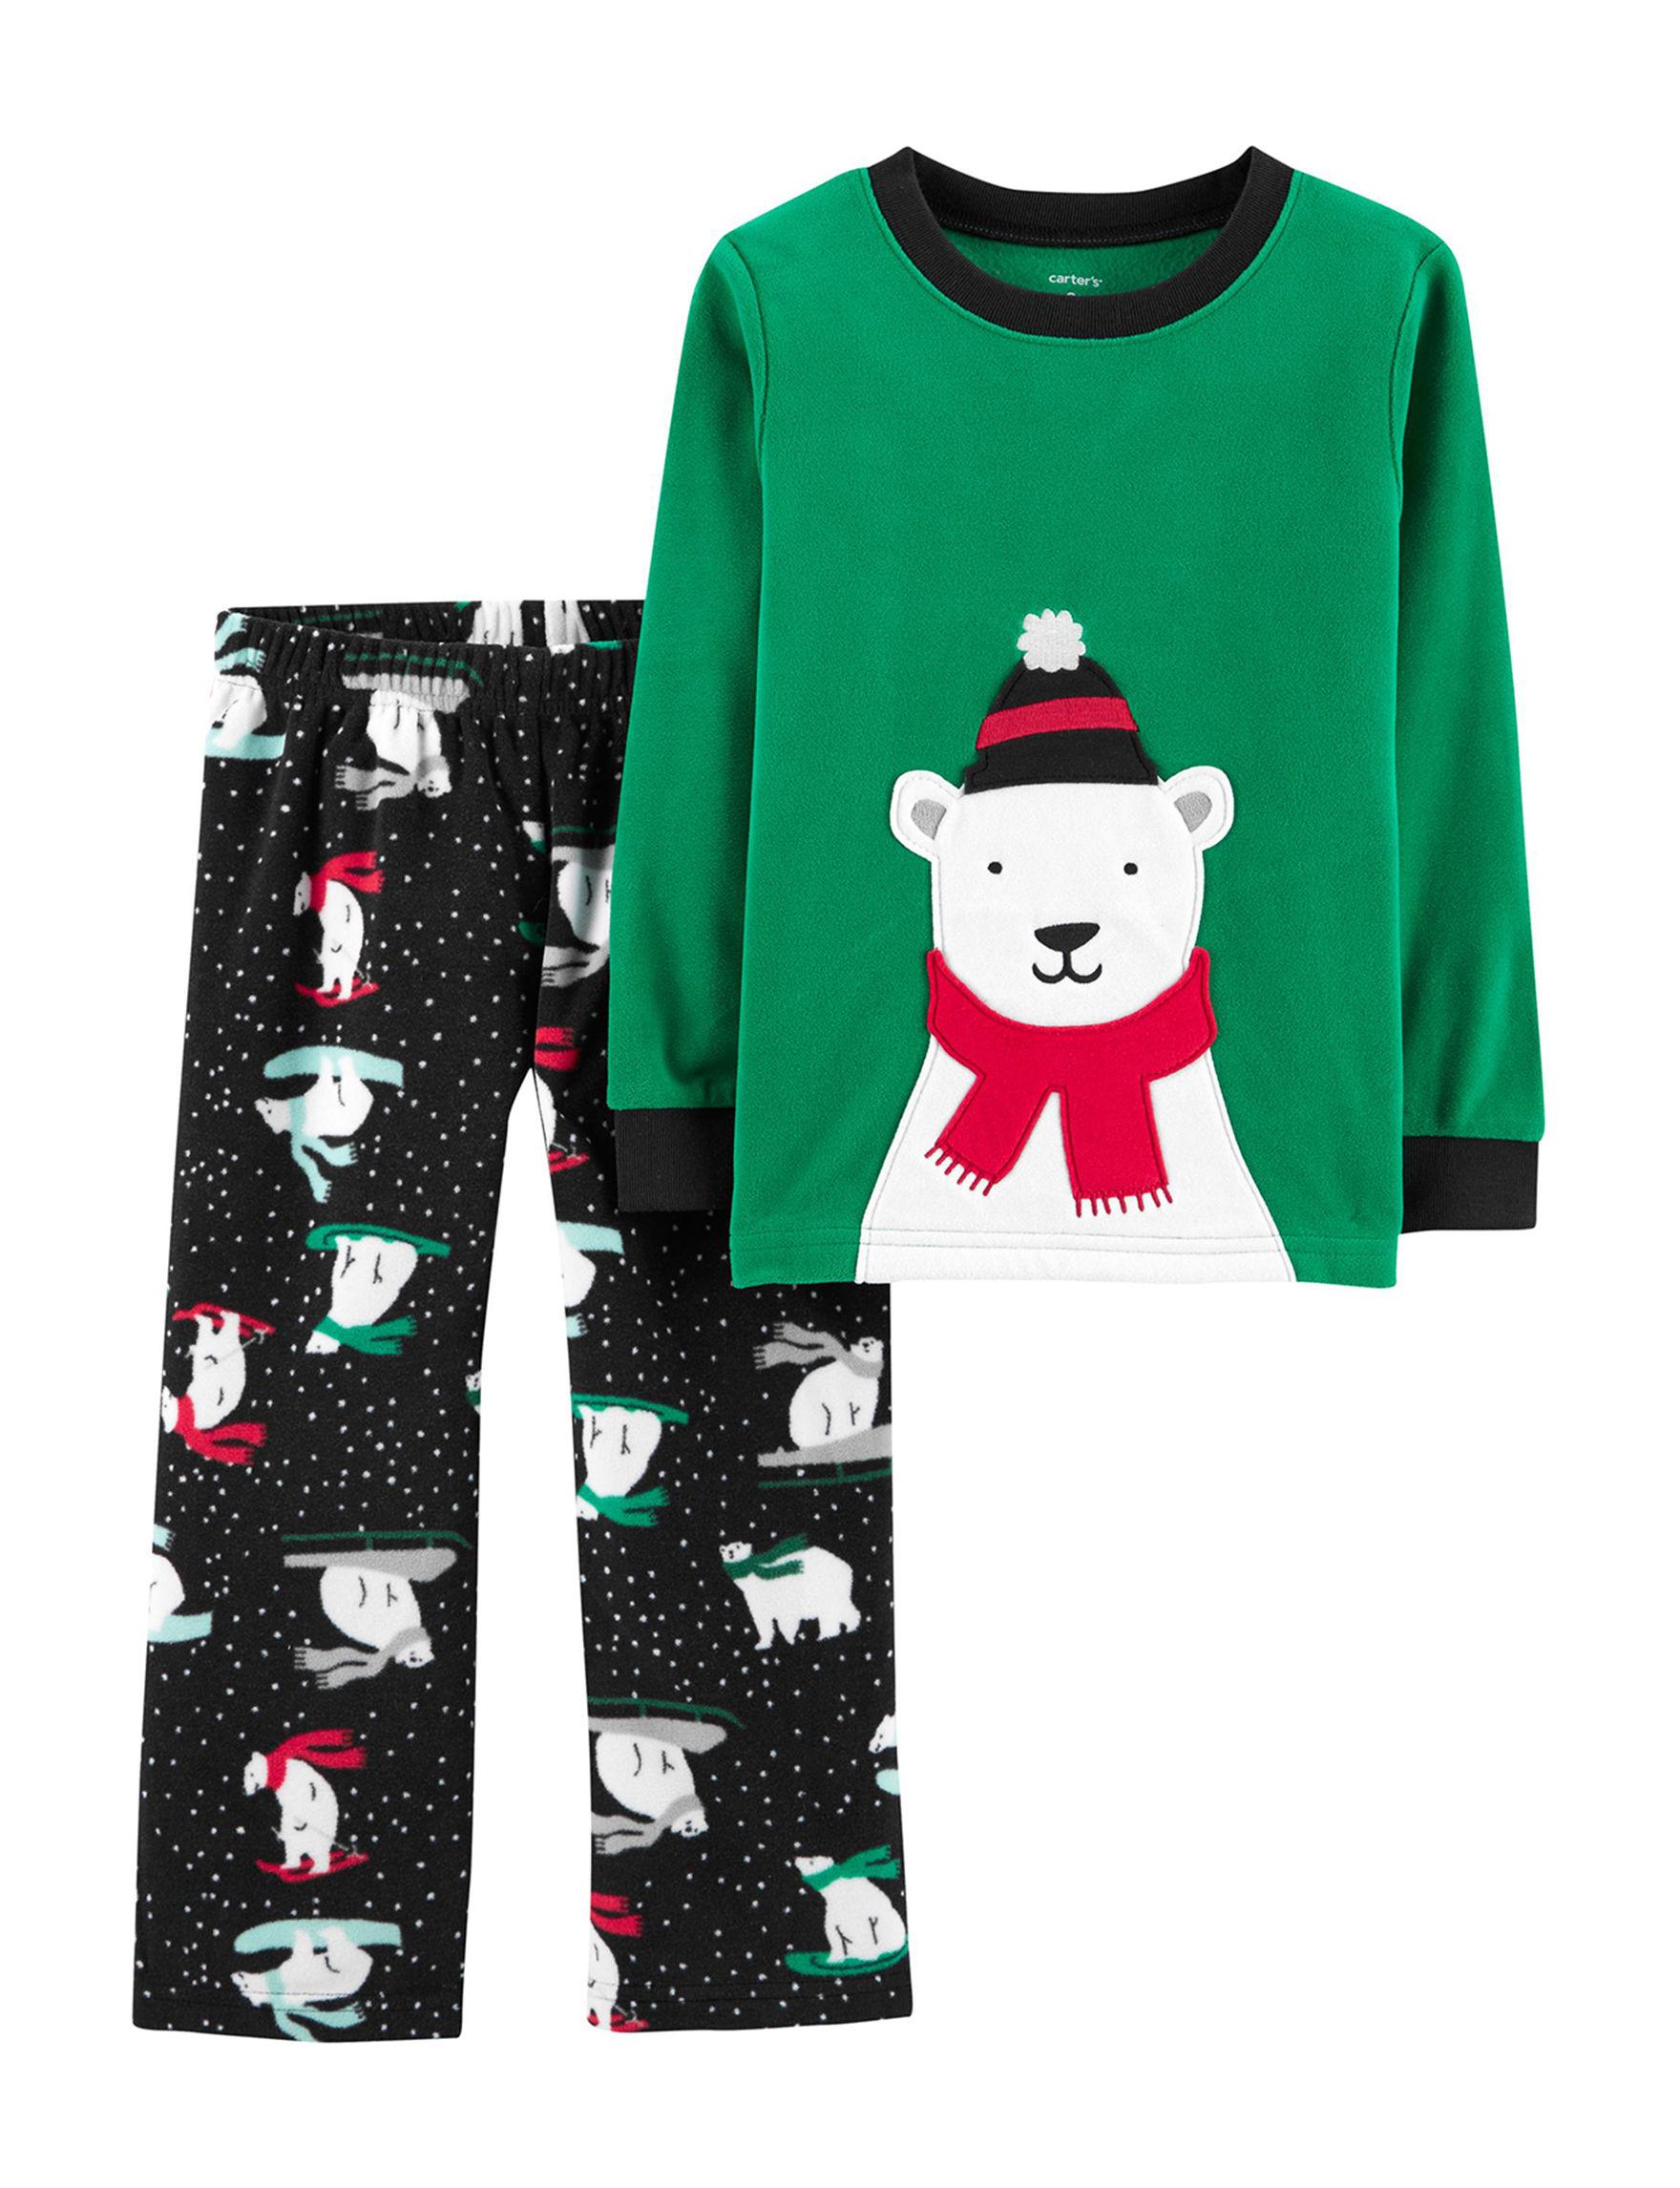 Carter's Green / Black Pajama Sets